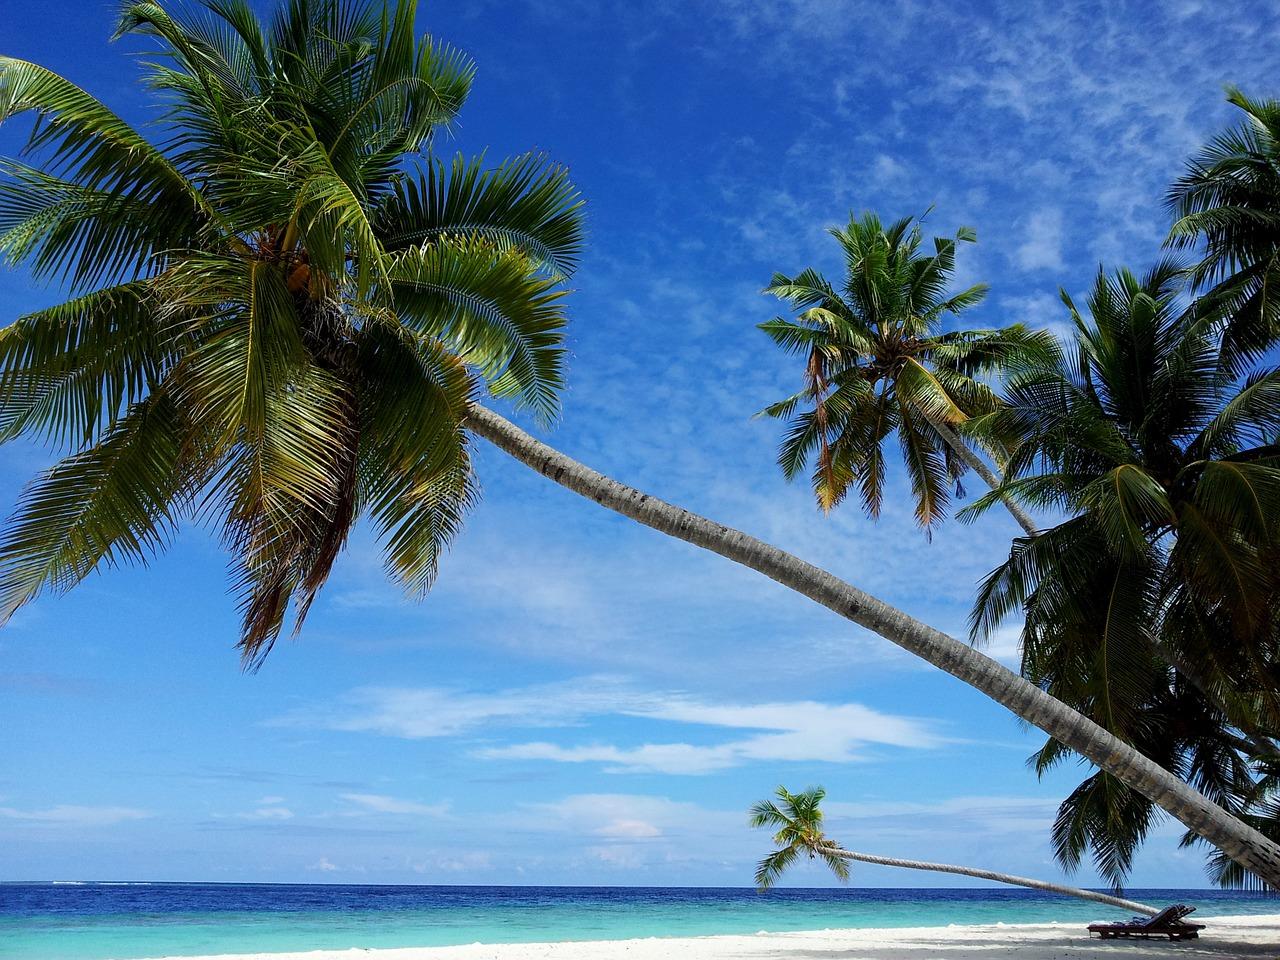 maldives-850508_1280